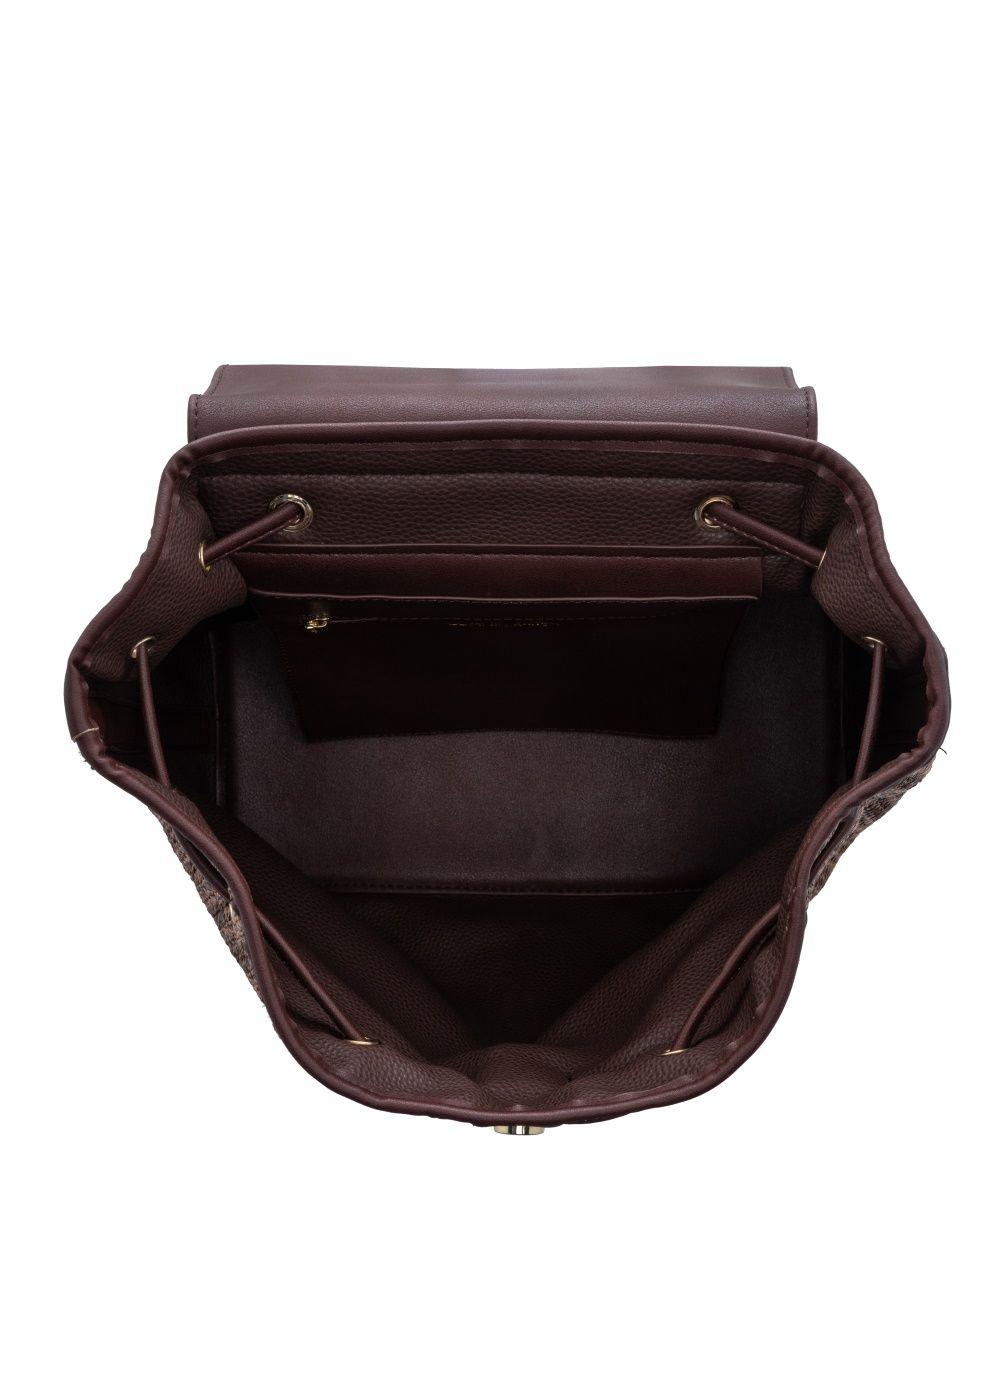 Plecak damski TOREC-0212-89(W20)